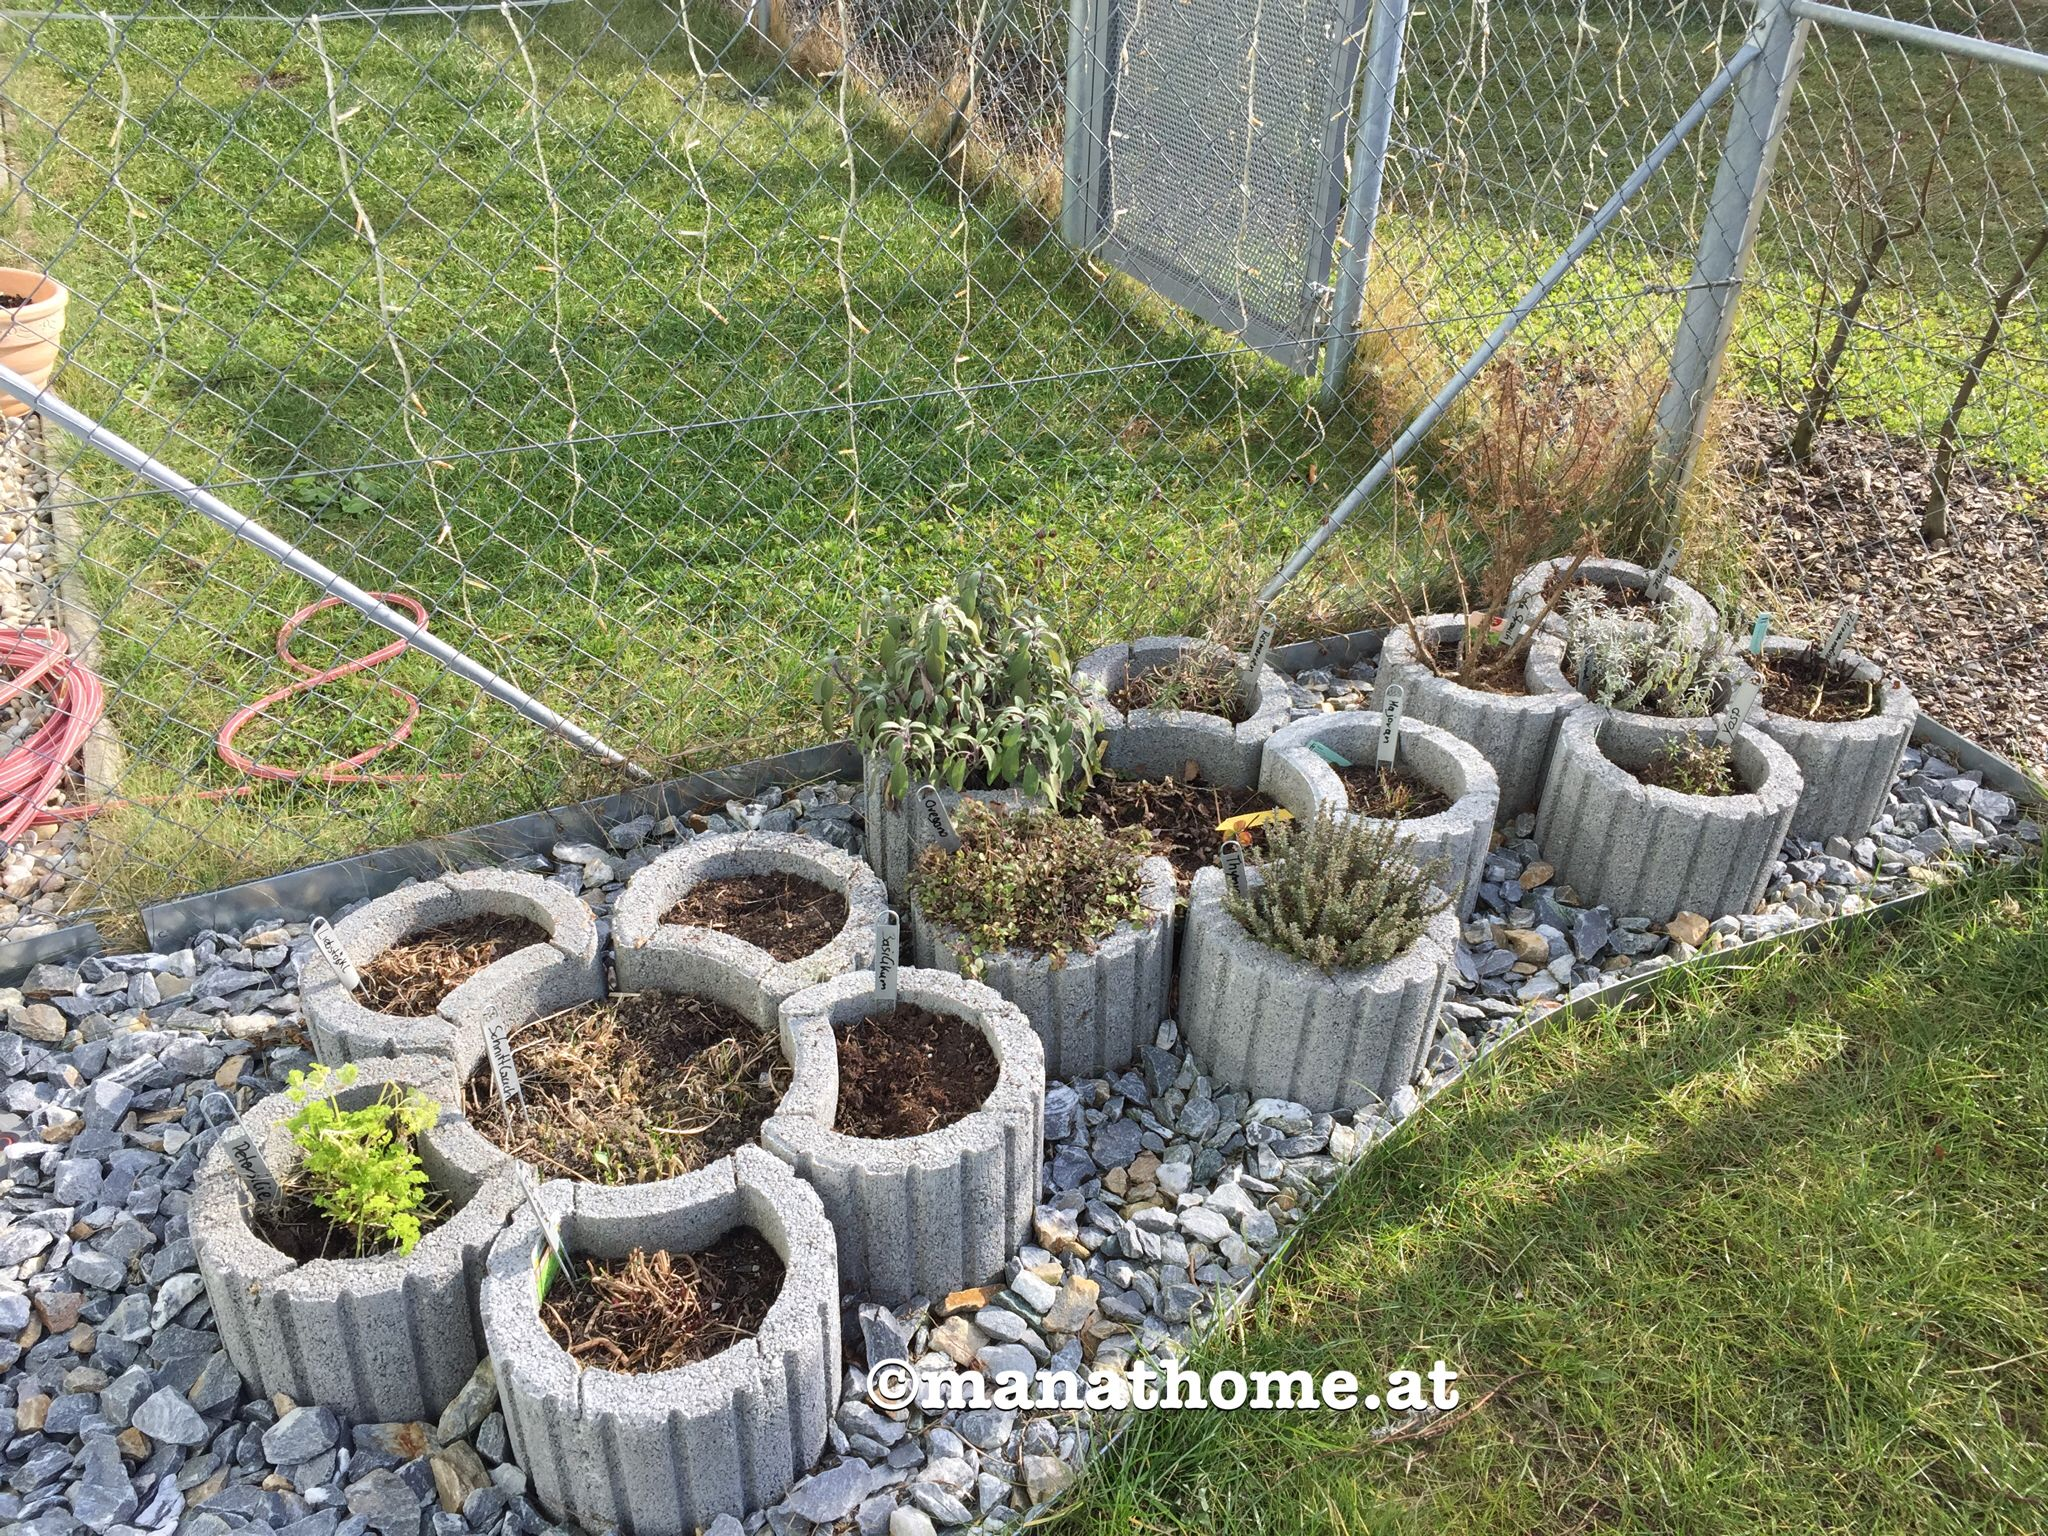 gartengestaltung kräuterbeet kräutergarten #kräuterbeet #kräuter #garten